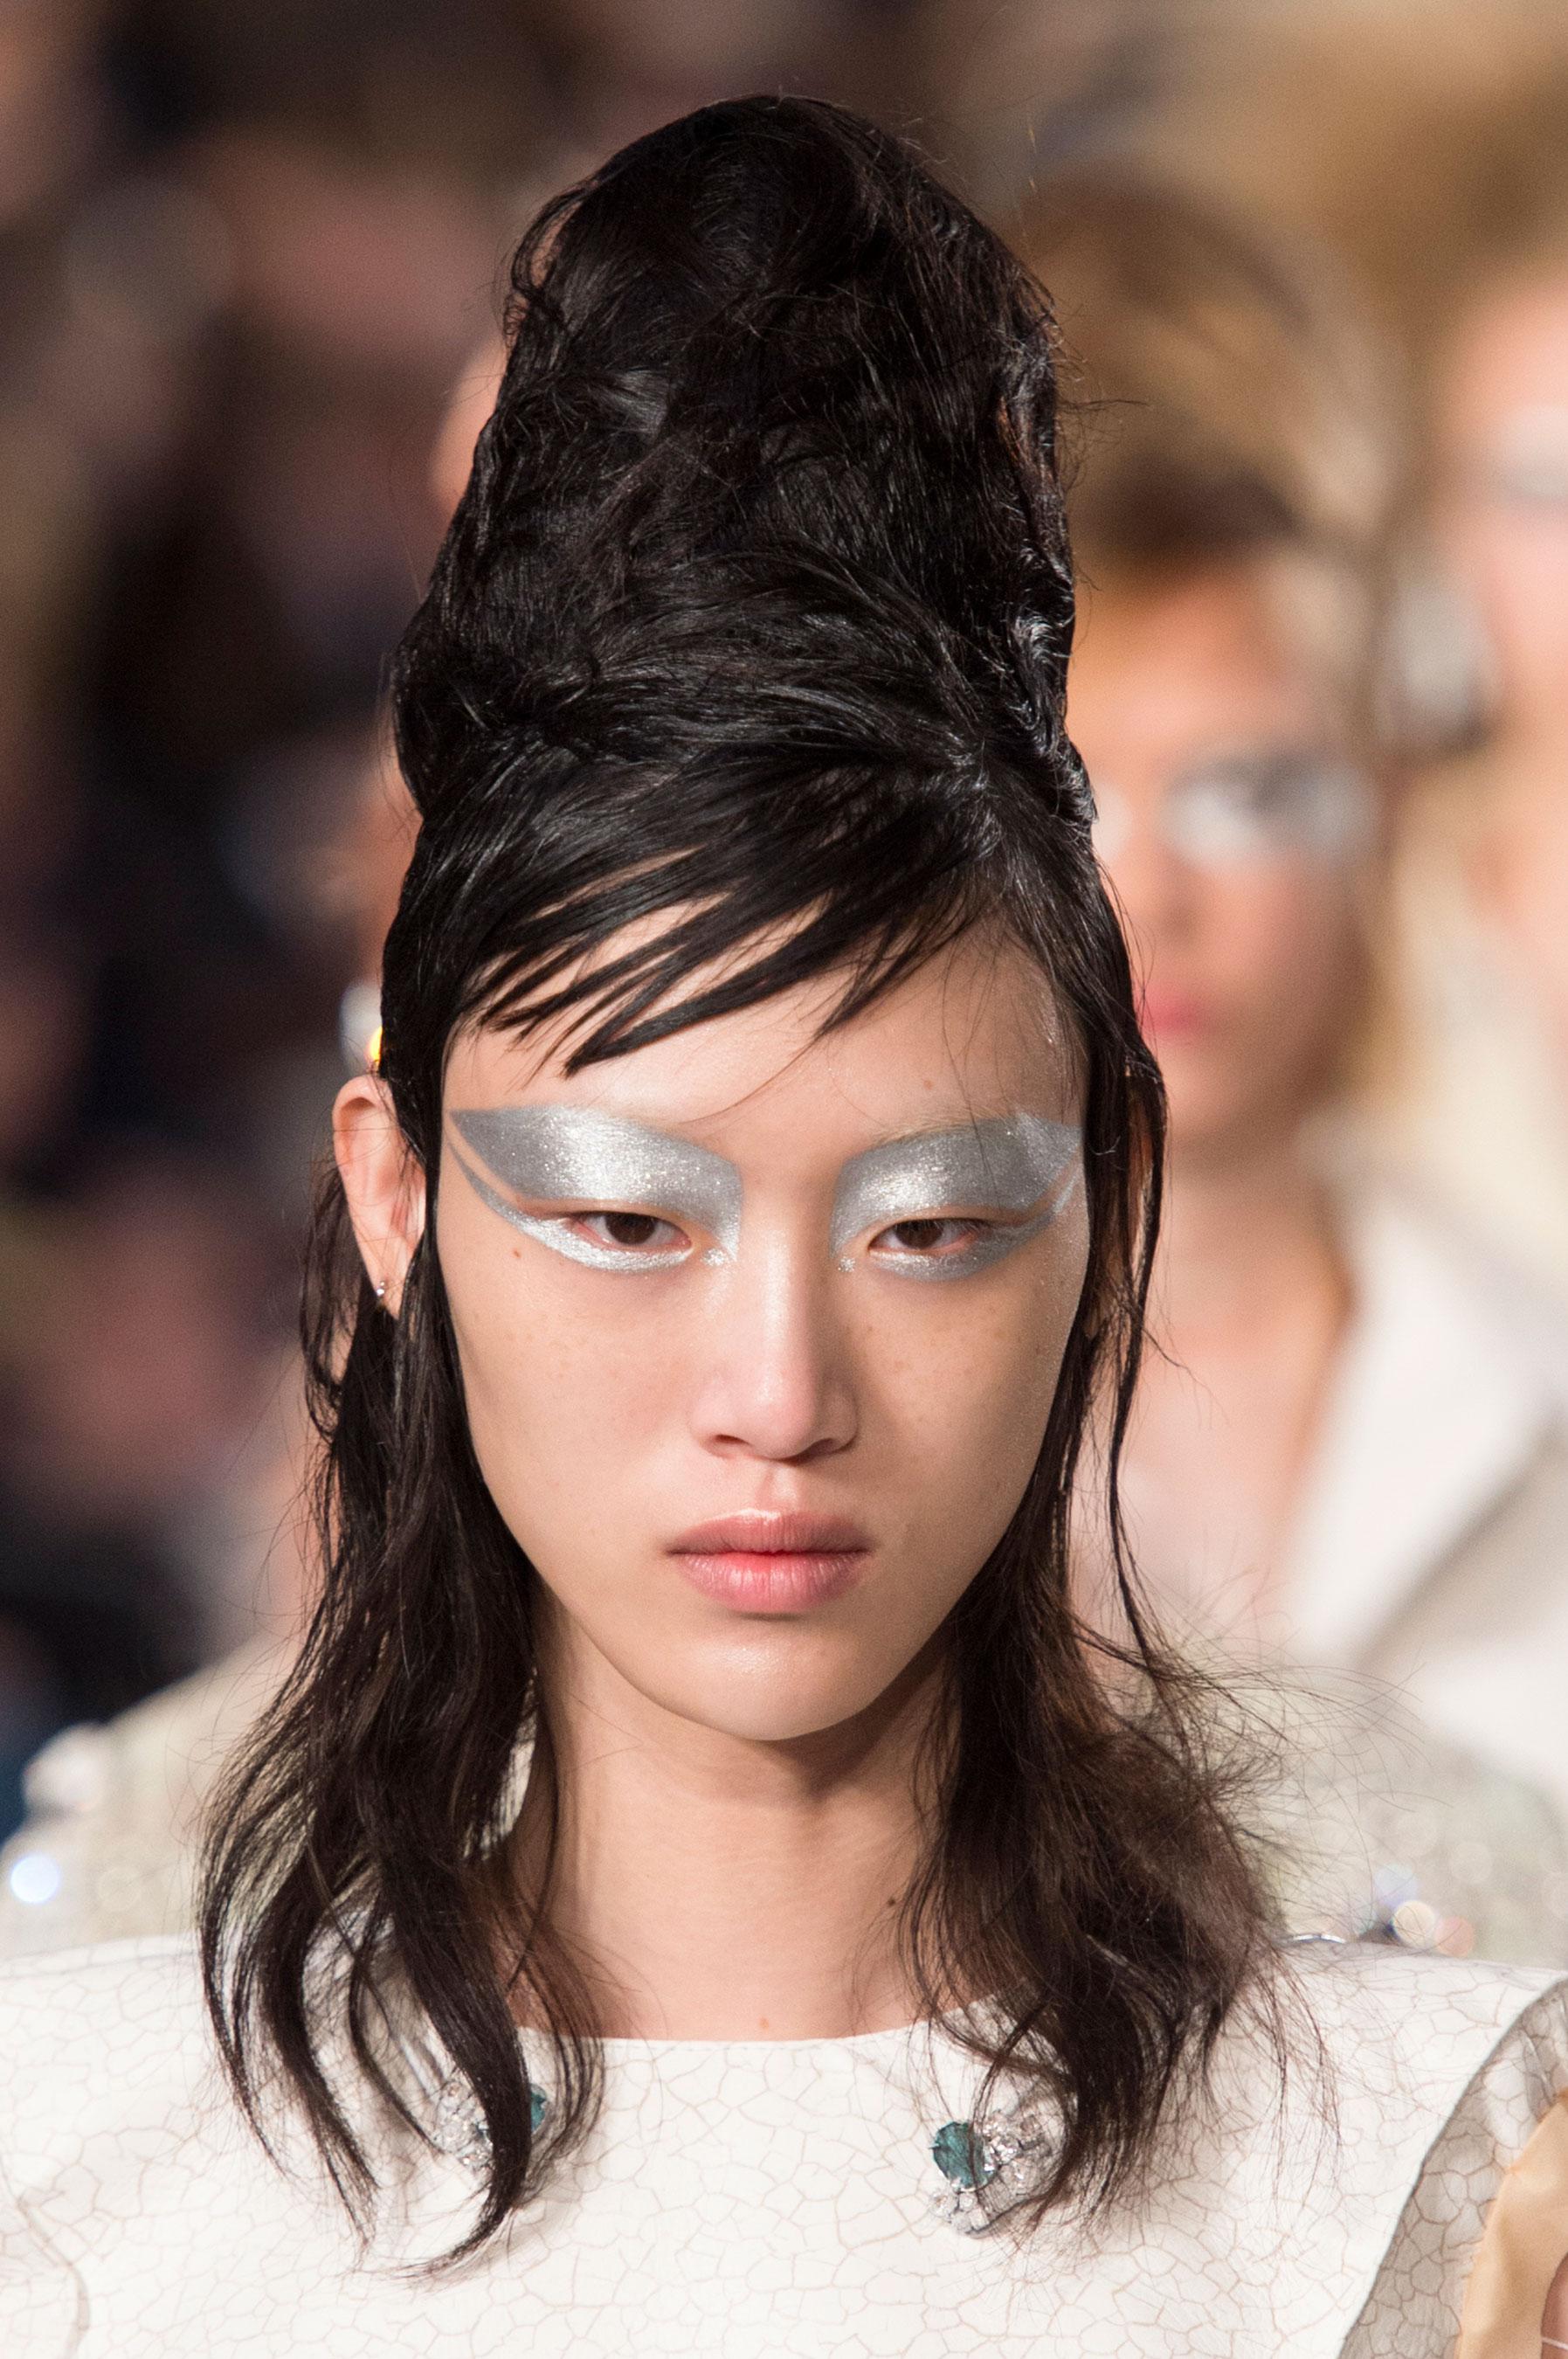 Maison-Margiela-spring-2016-runway-beauty-fashion-show-the-impression-060